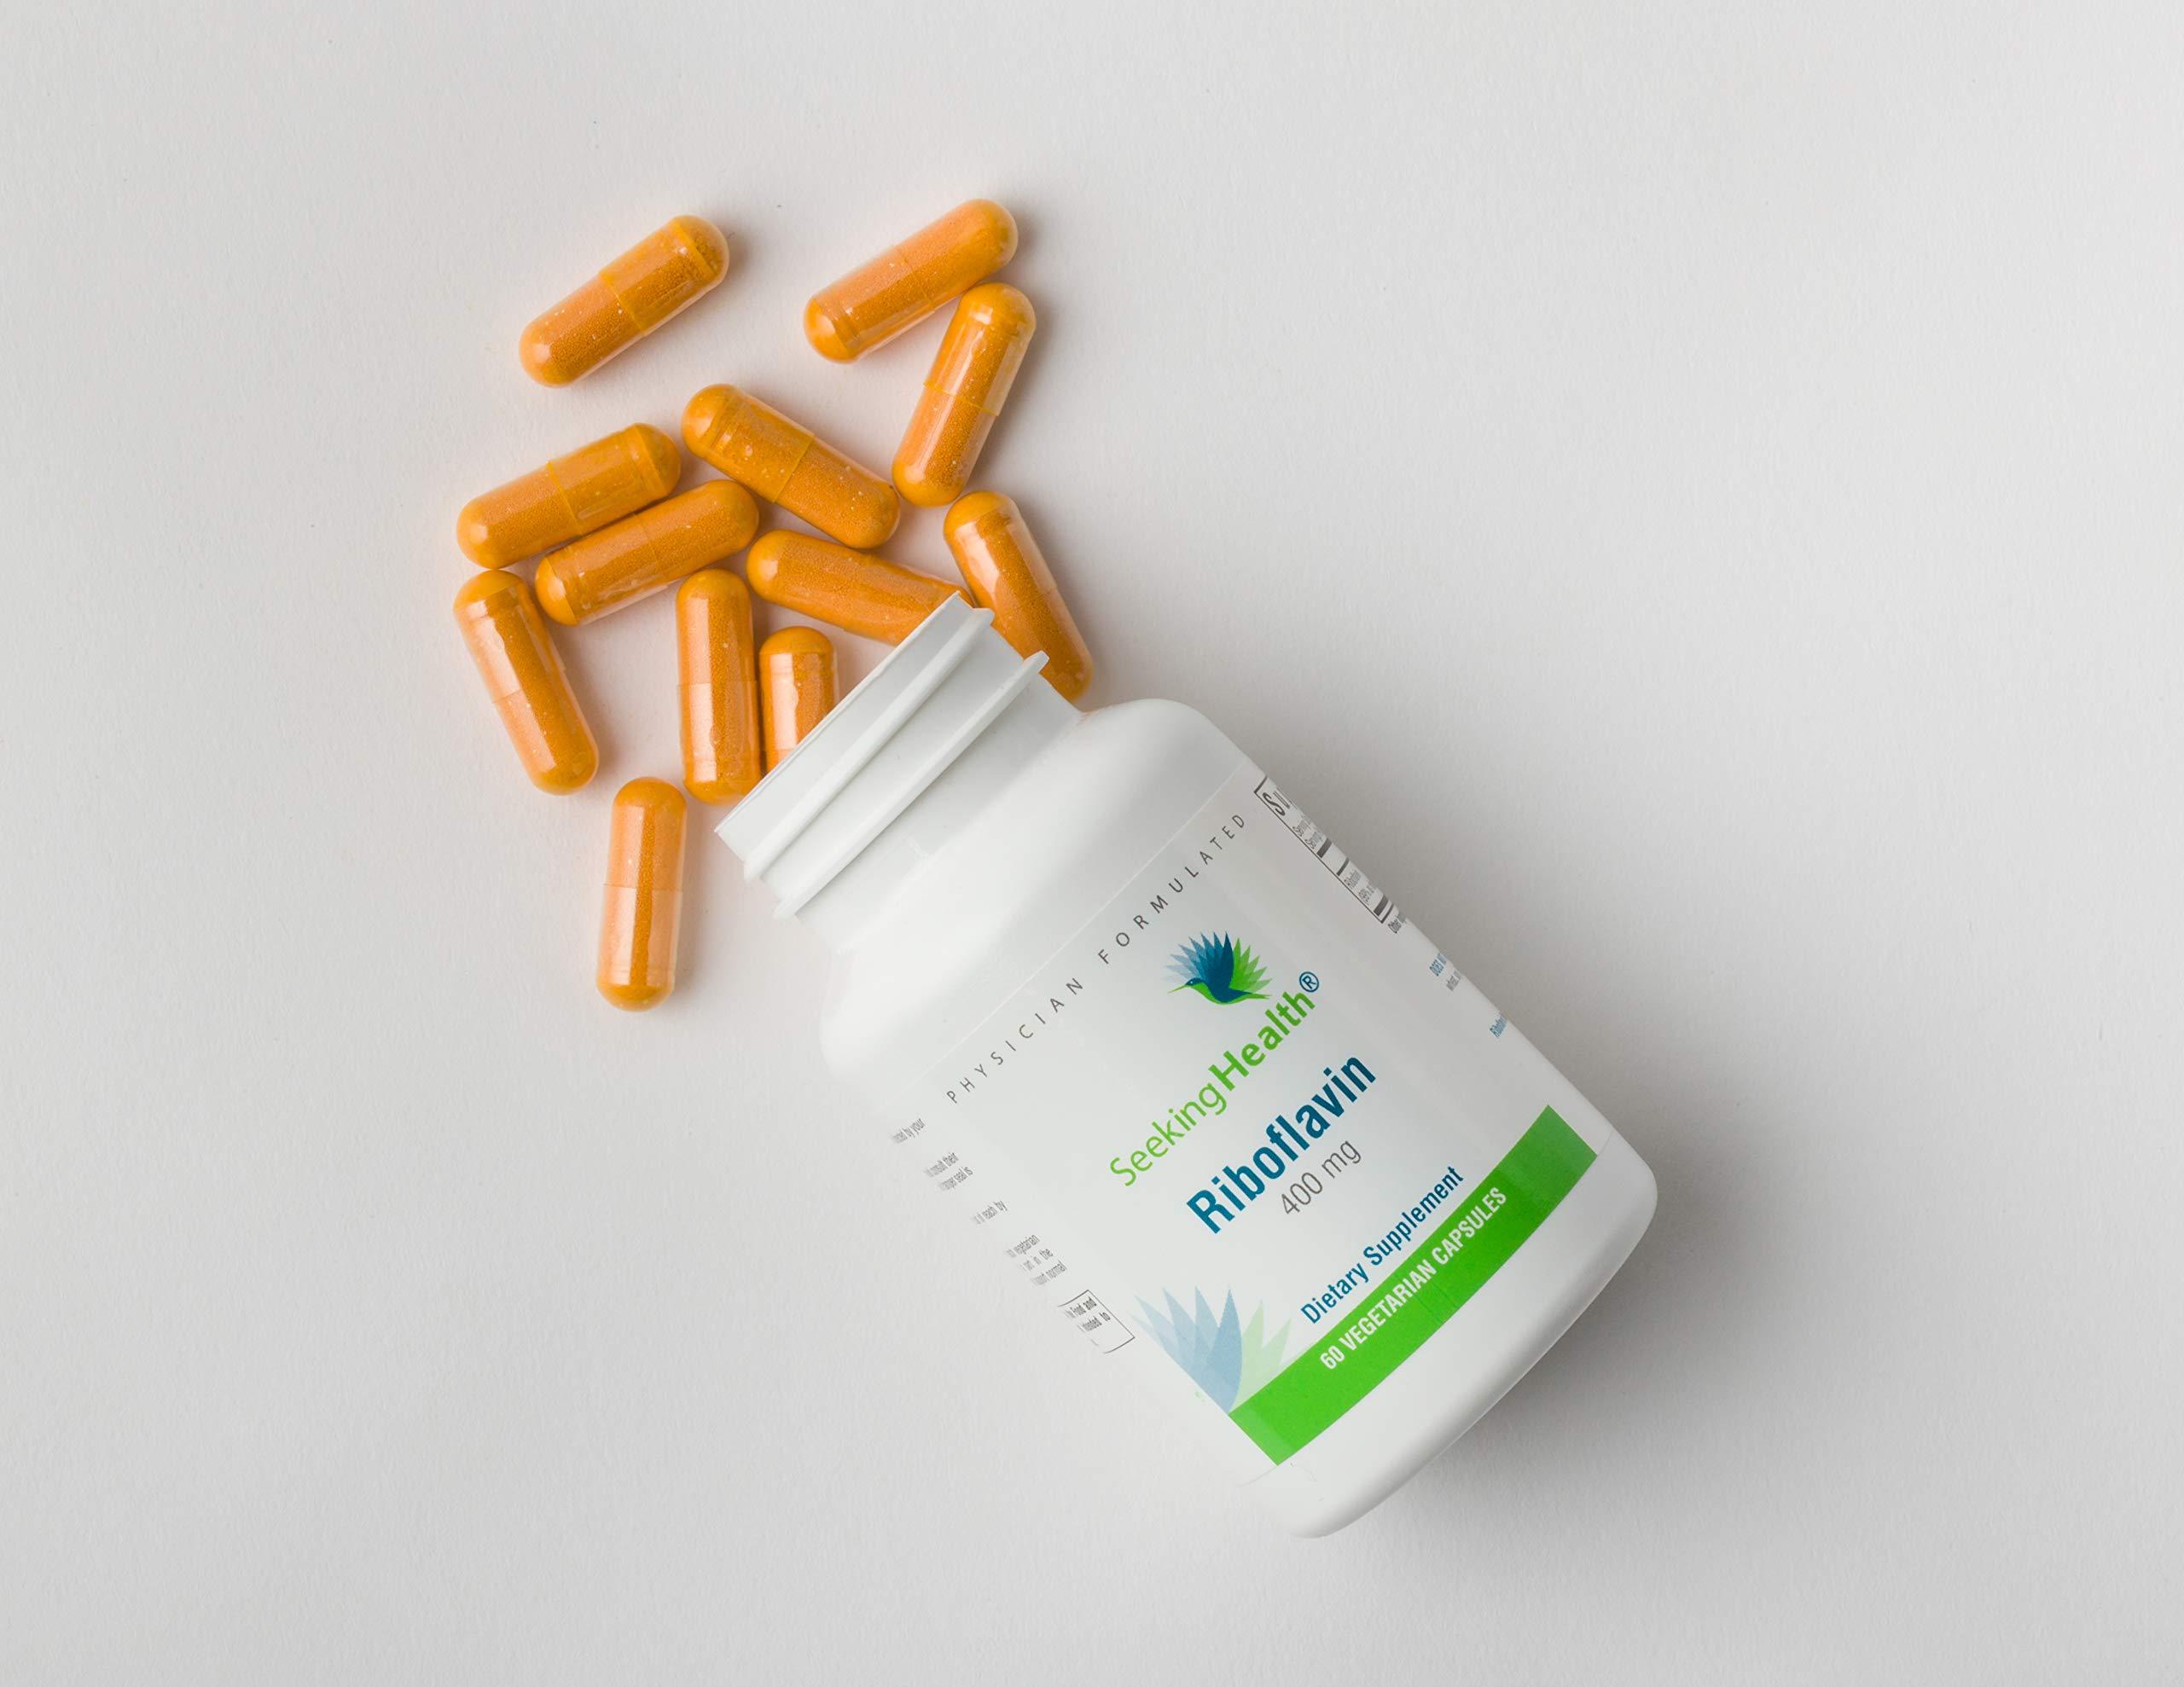 Riboflavin   60 Vegetarian Capsules   Seeking Health   400 mg Riboflavin   Vitamin B2